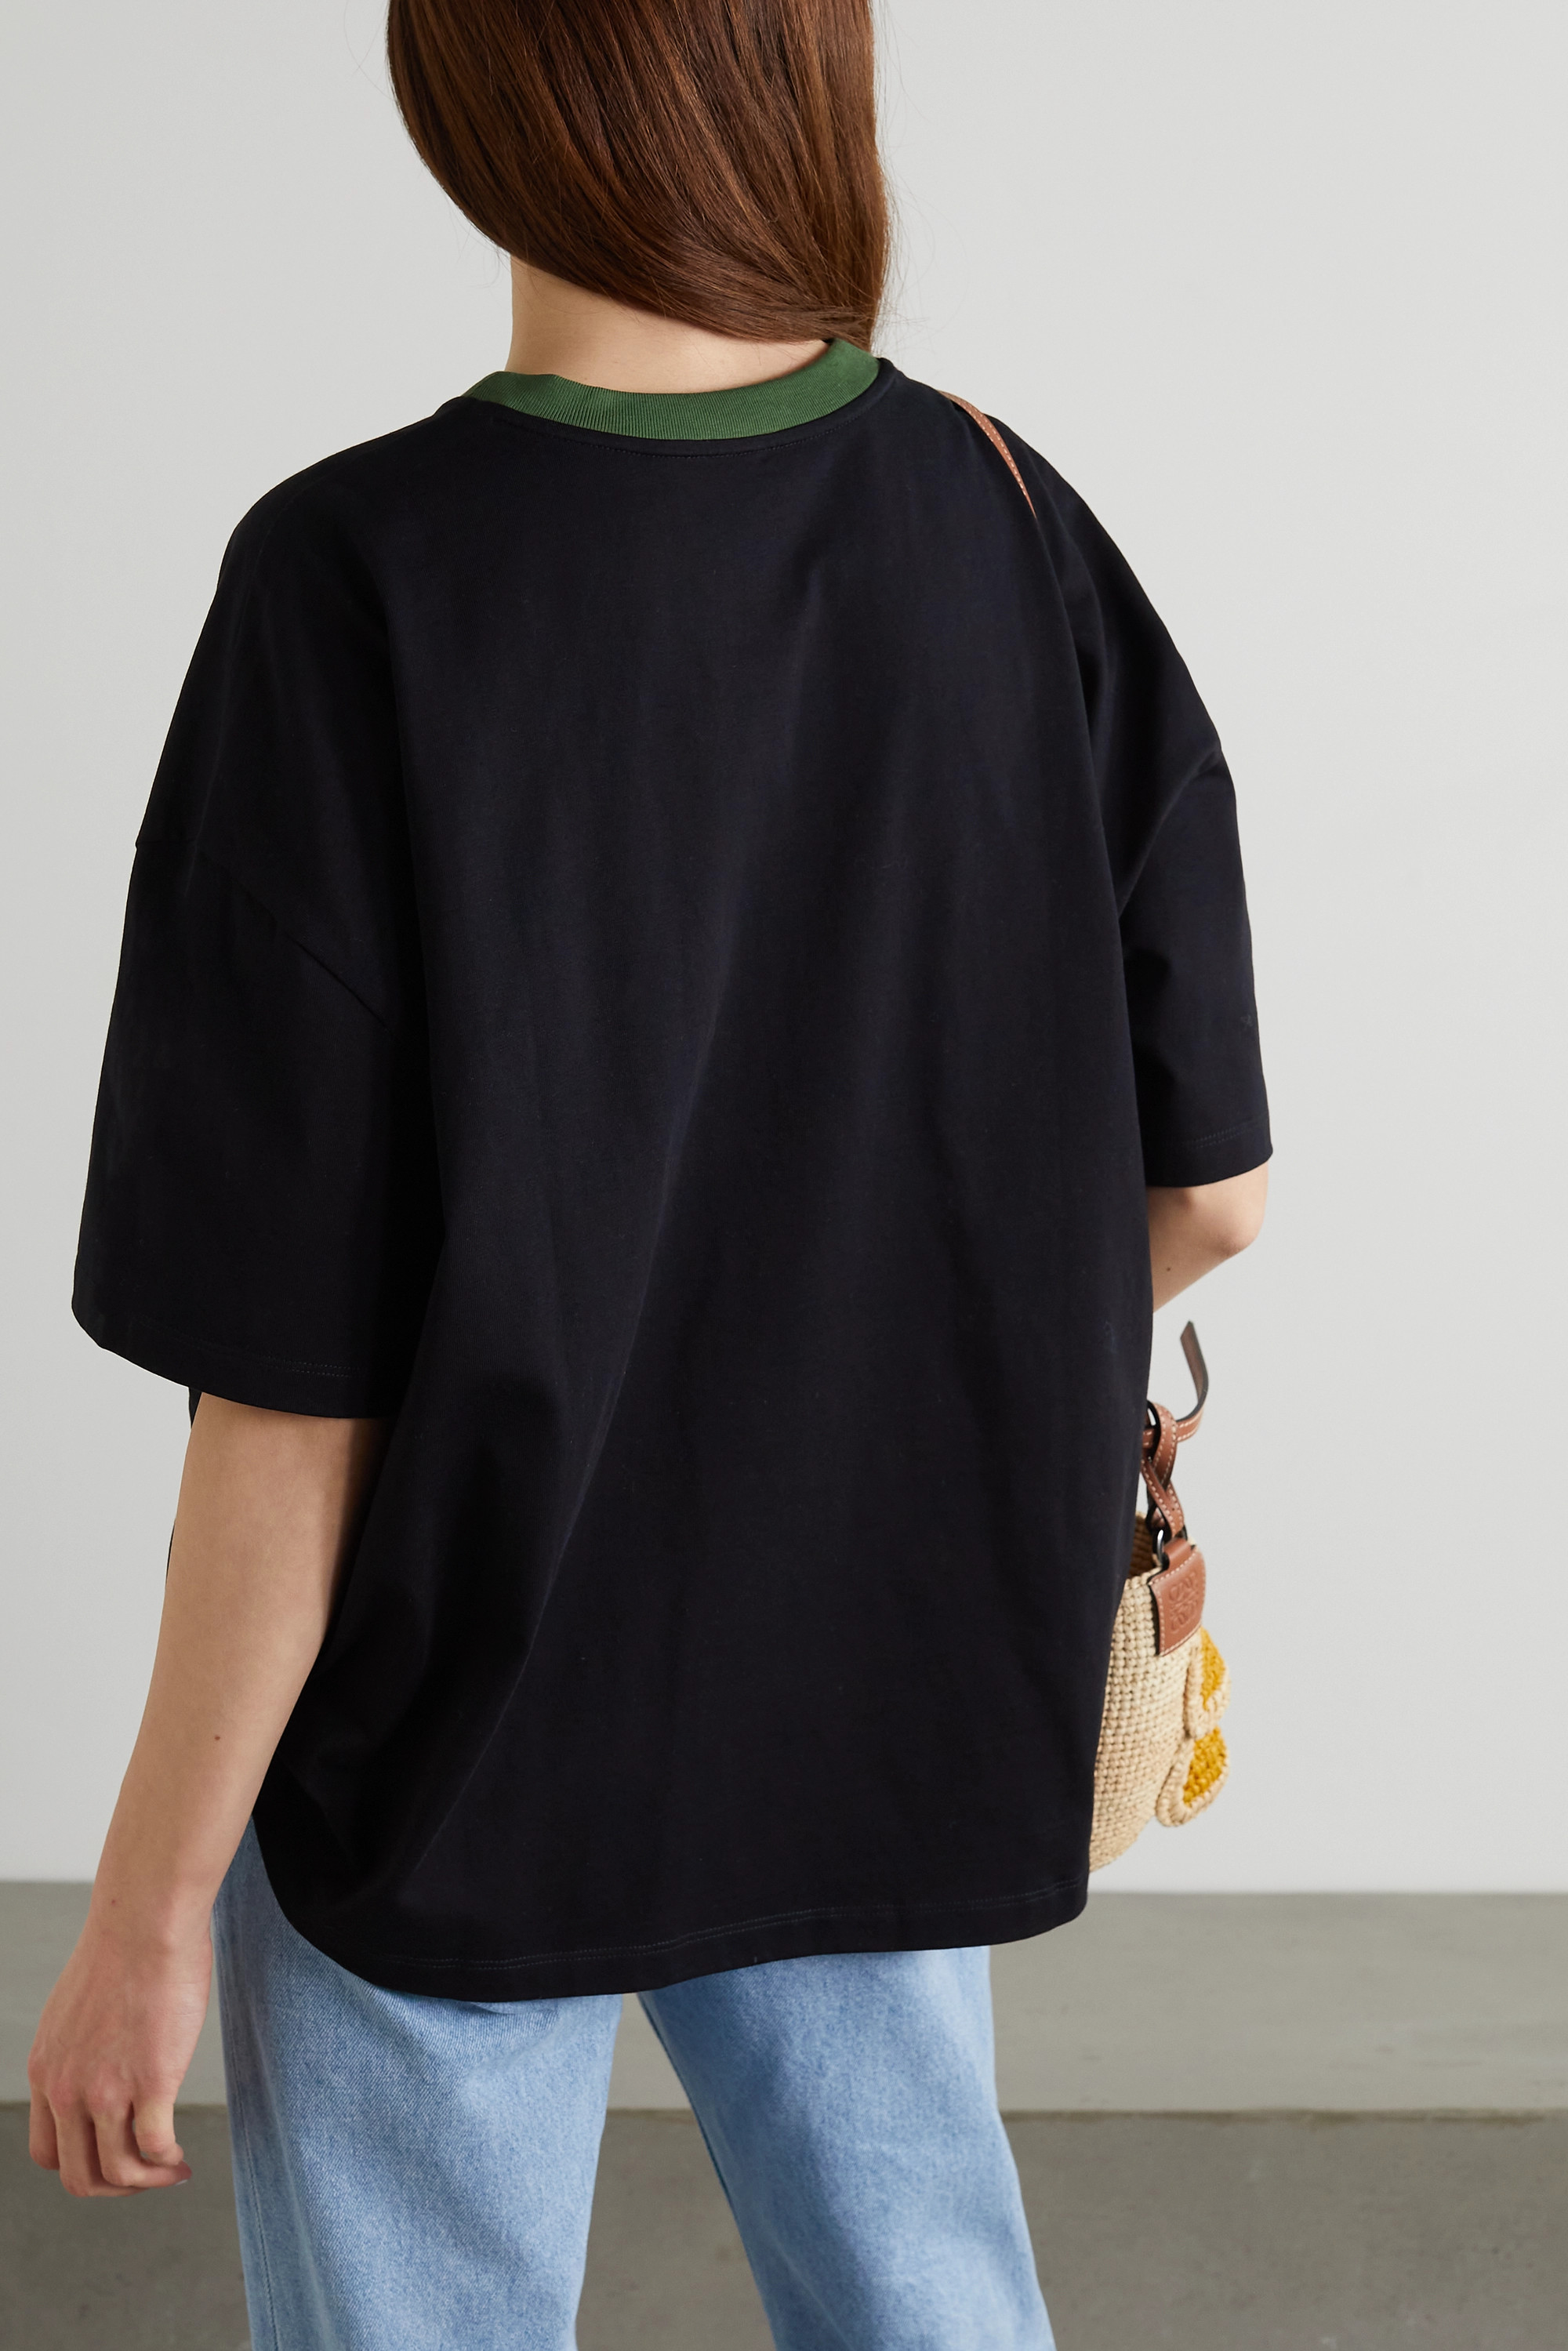 Loewe + Paula's Ibiza appliquéd printed cotton-jersey t-shirt